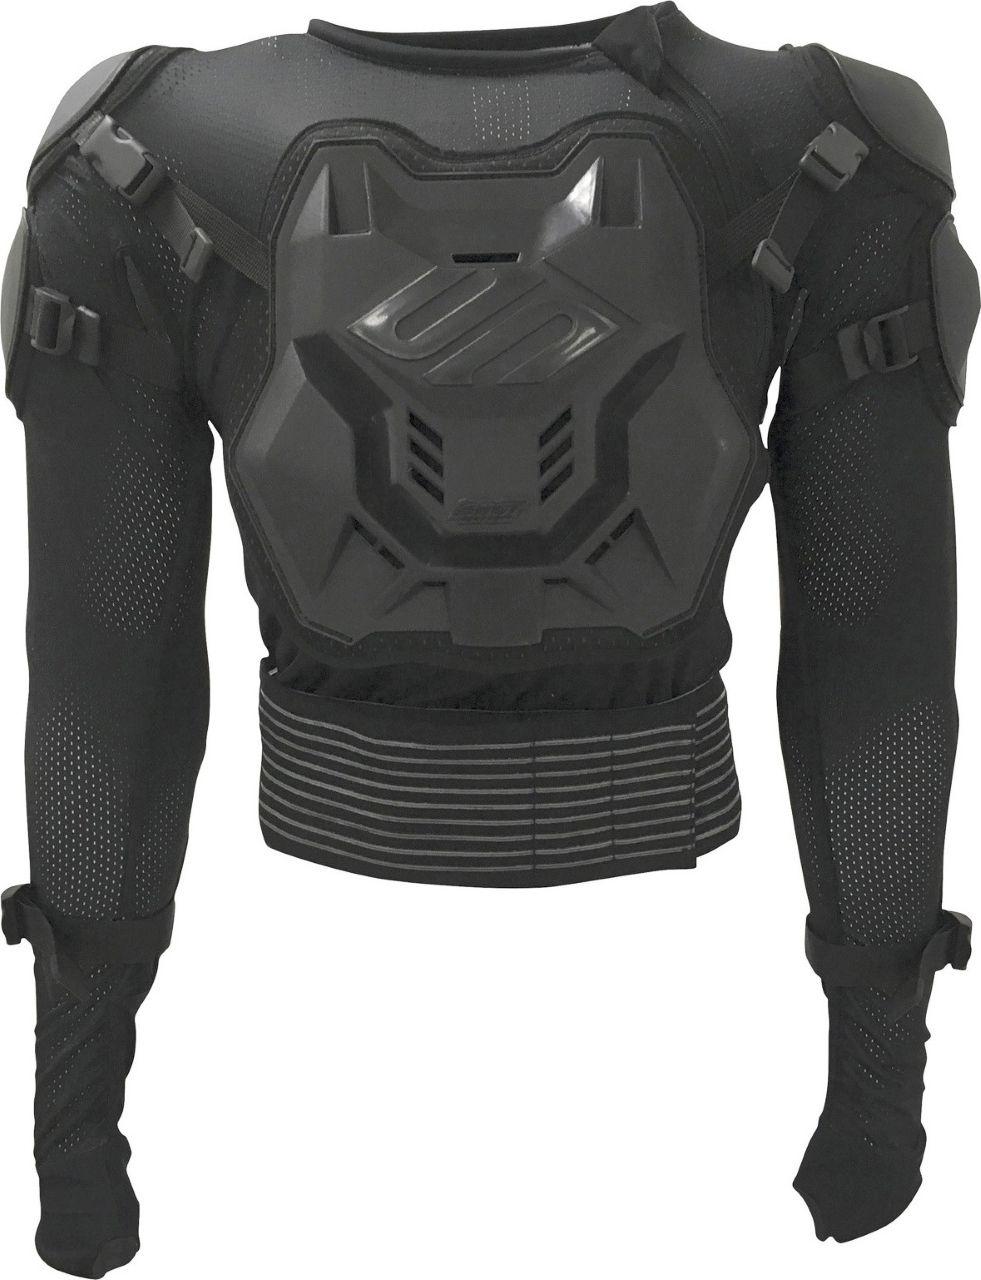 body armor - 1000×1000